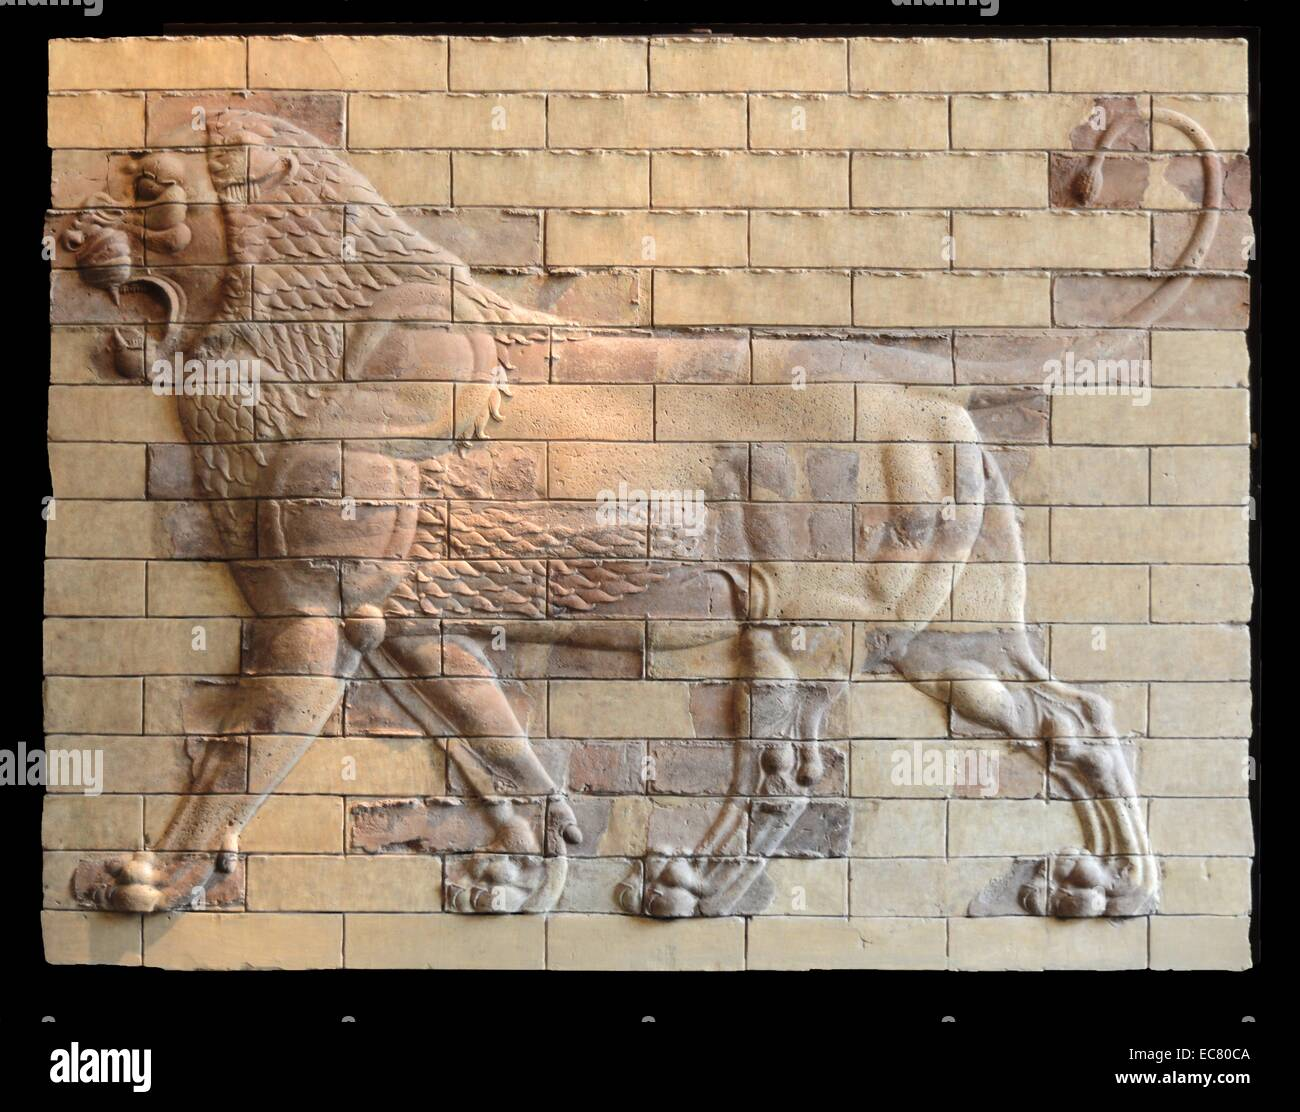 Decorative panels of molded bricks - terracotta. Shushan, the Palace of Darius. - Stock Image